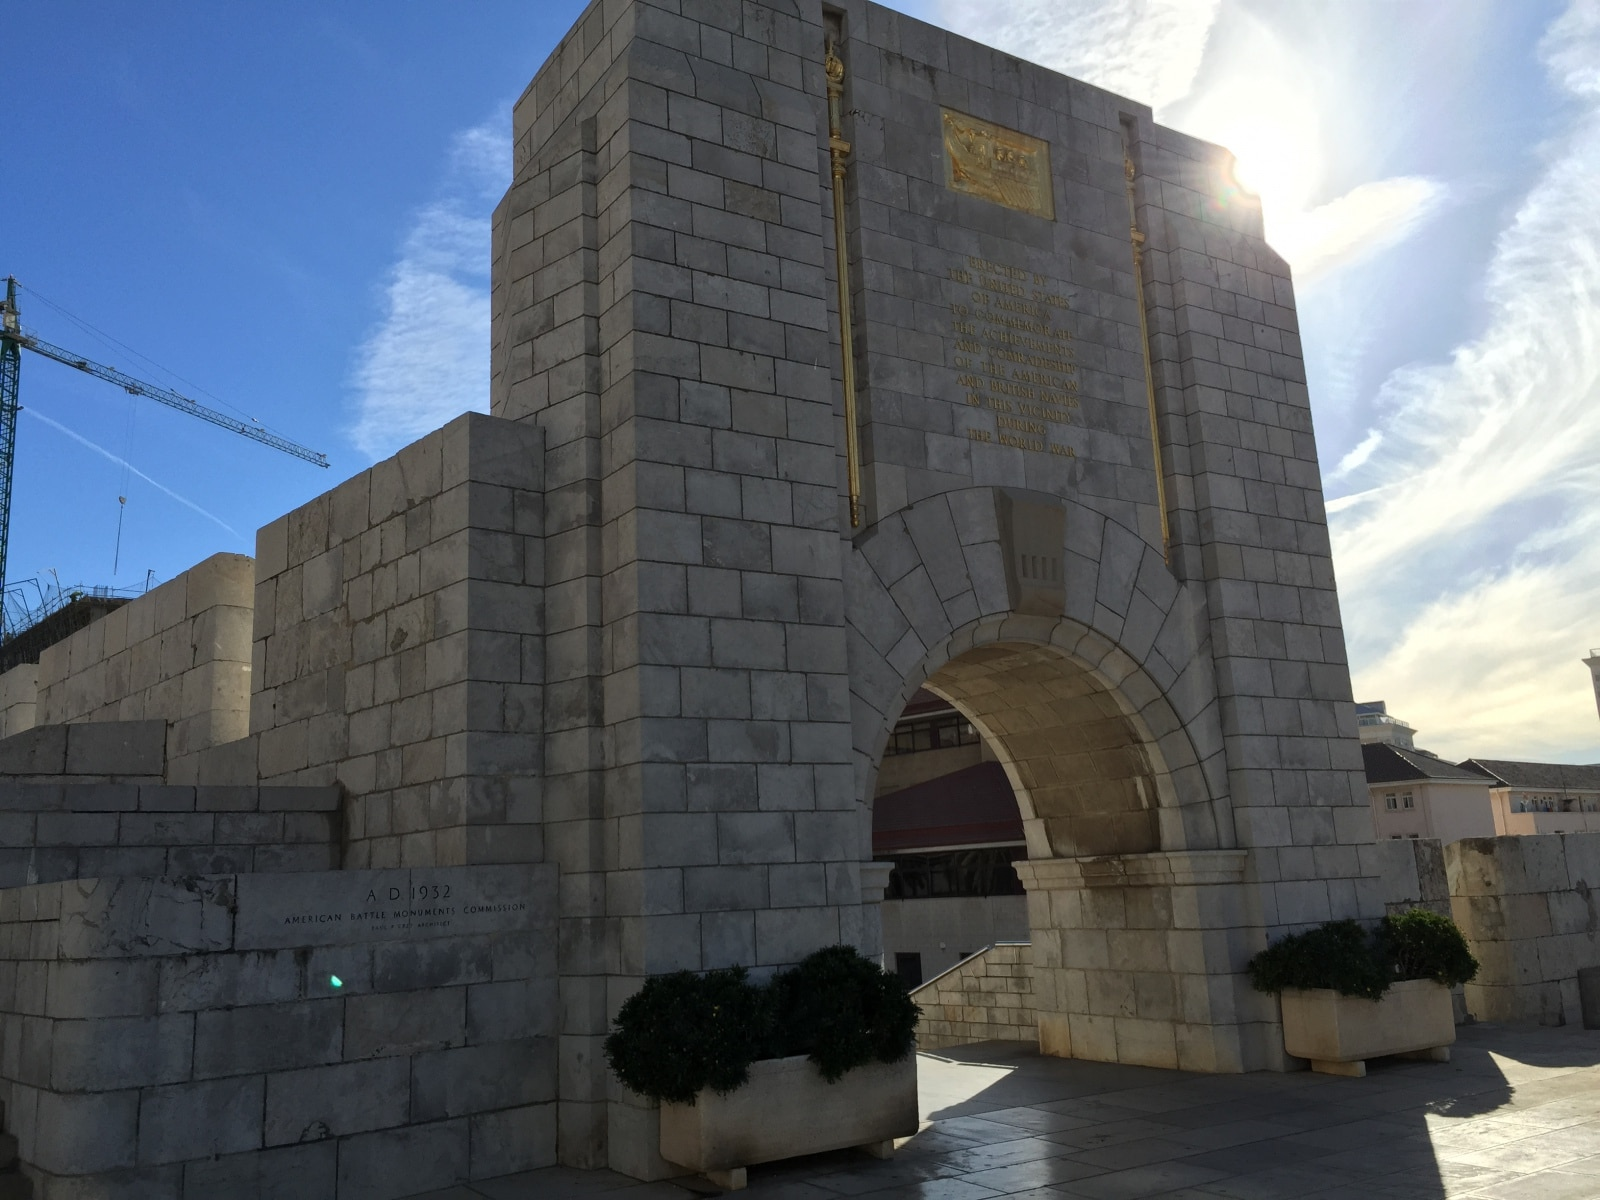 memorial-en-honor-a-los-cados-estadounidenses-en-gibraltar-durante-la-i-guerra-mundial_22119577283_o